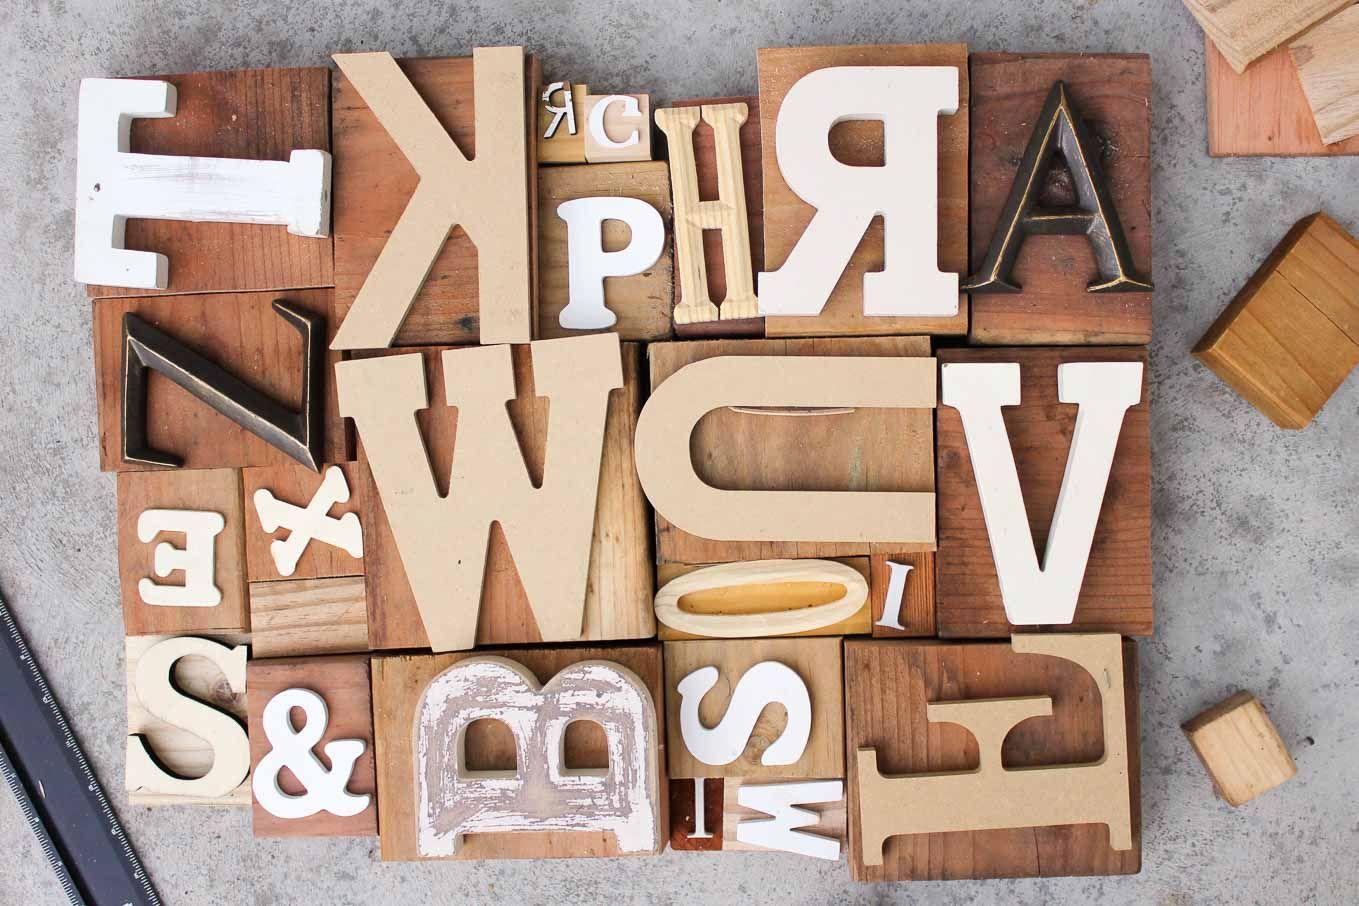 Diy art idea with faux letterpress print blocks vintage diy art idea with faux letterpress print blocks solutioingenieria Images